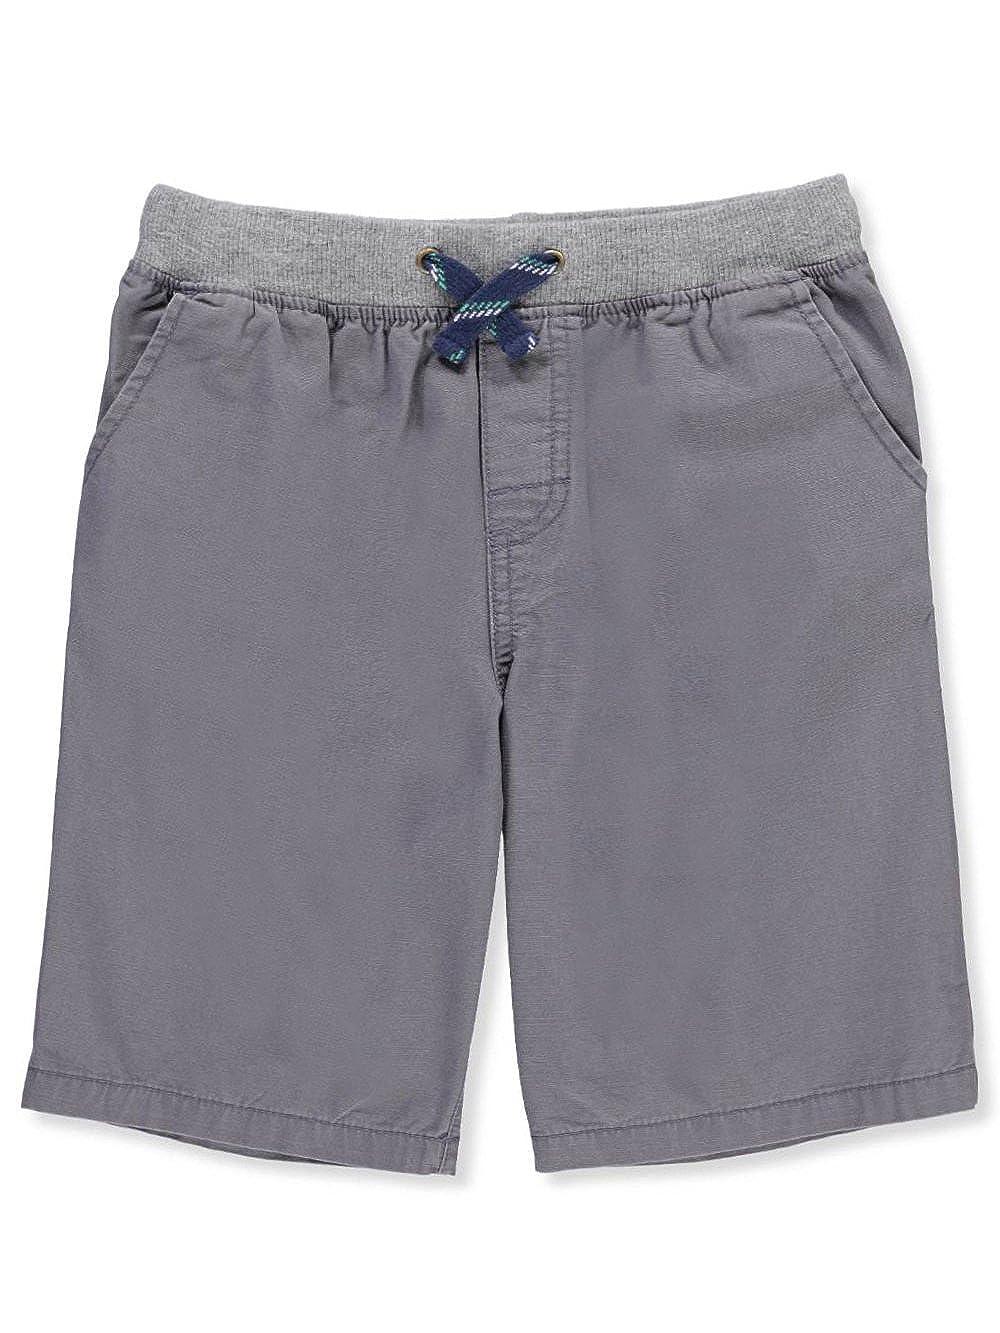 Carters Boys 4-8 Ribbed Waist Shorts